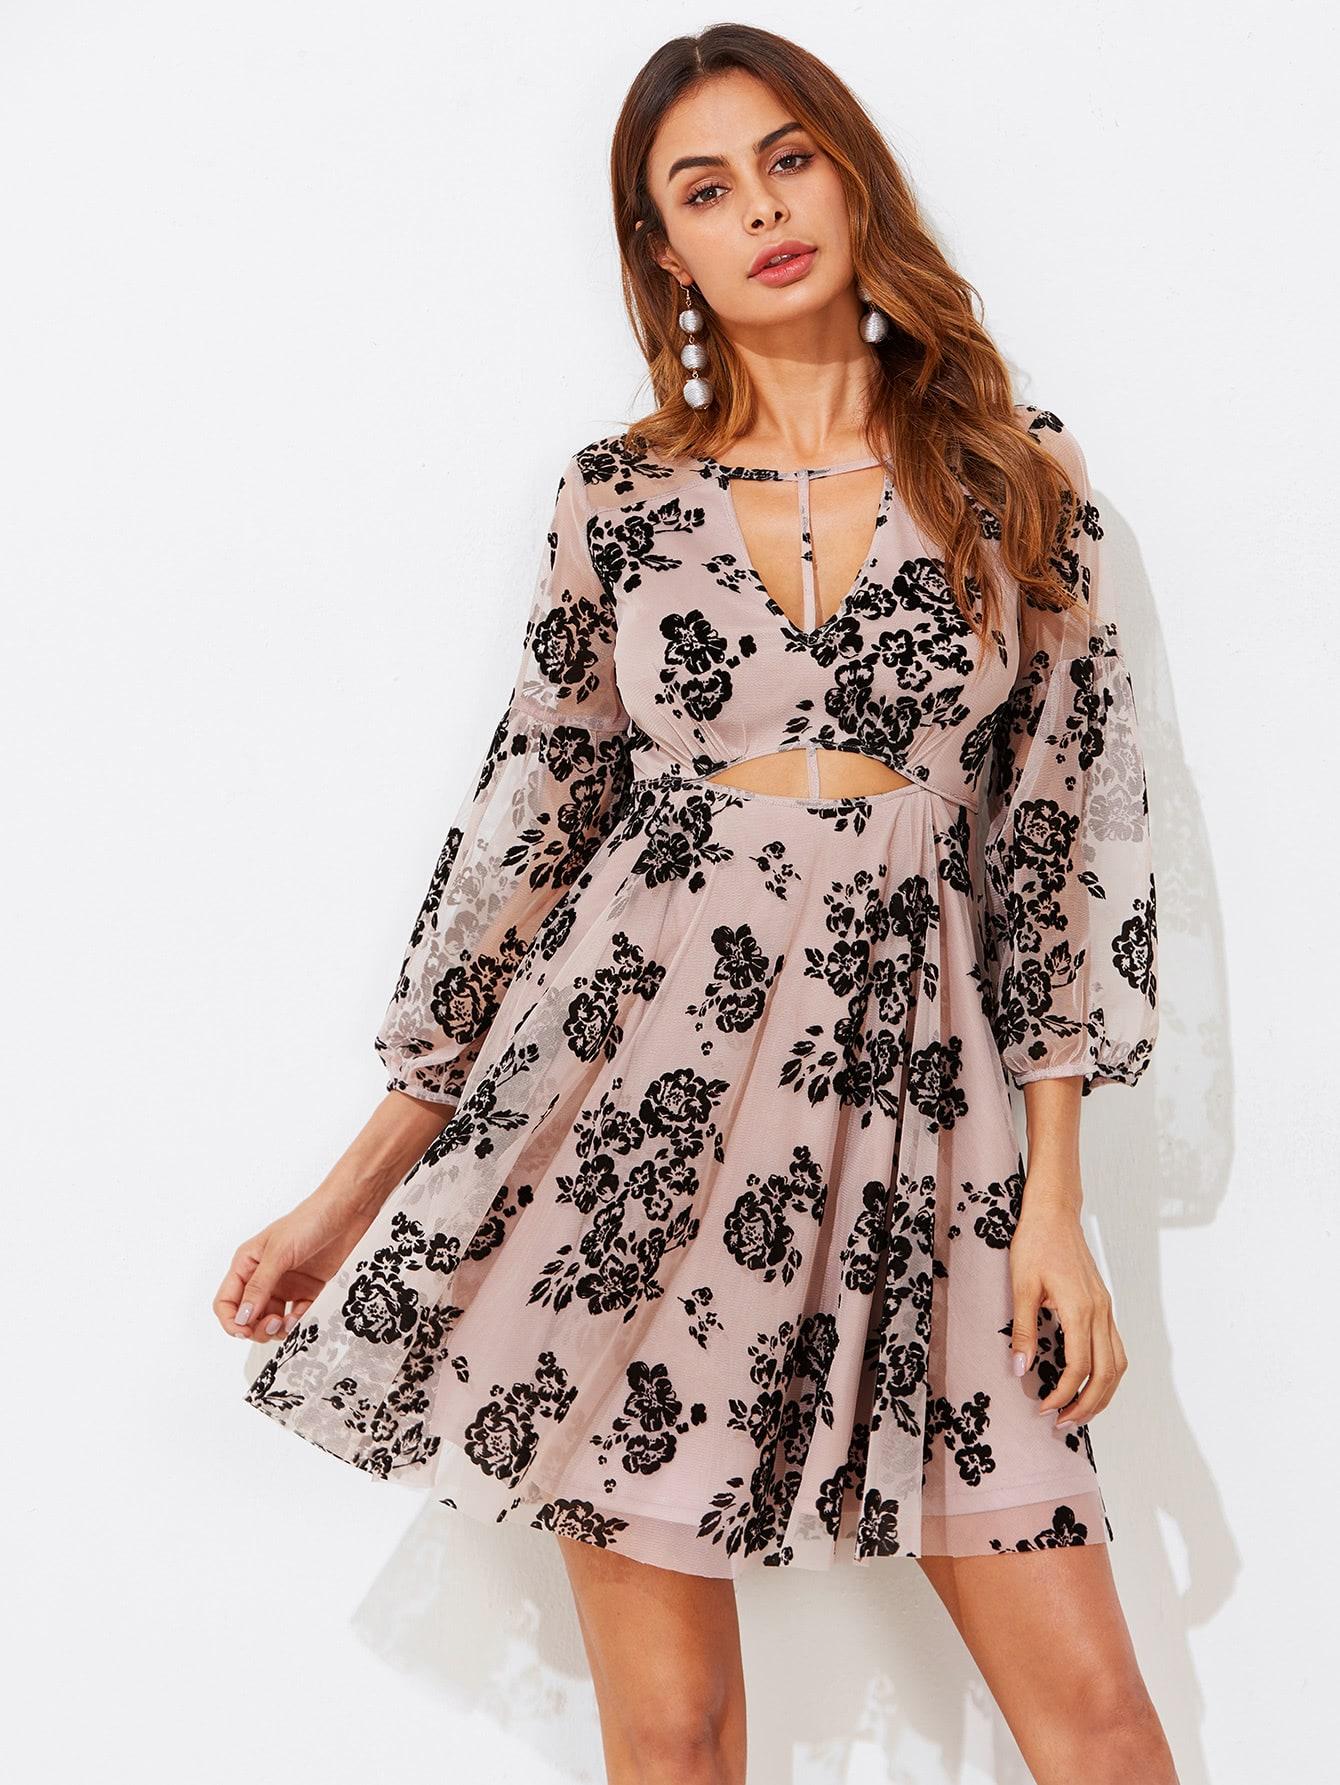 T-strap Front Cutout Midriff Flock Mesh Dress knot front cutout midriff halterneck gingham dress